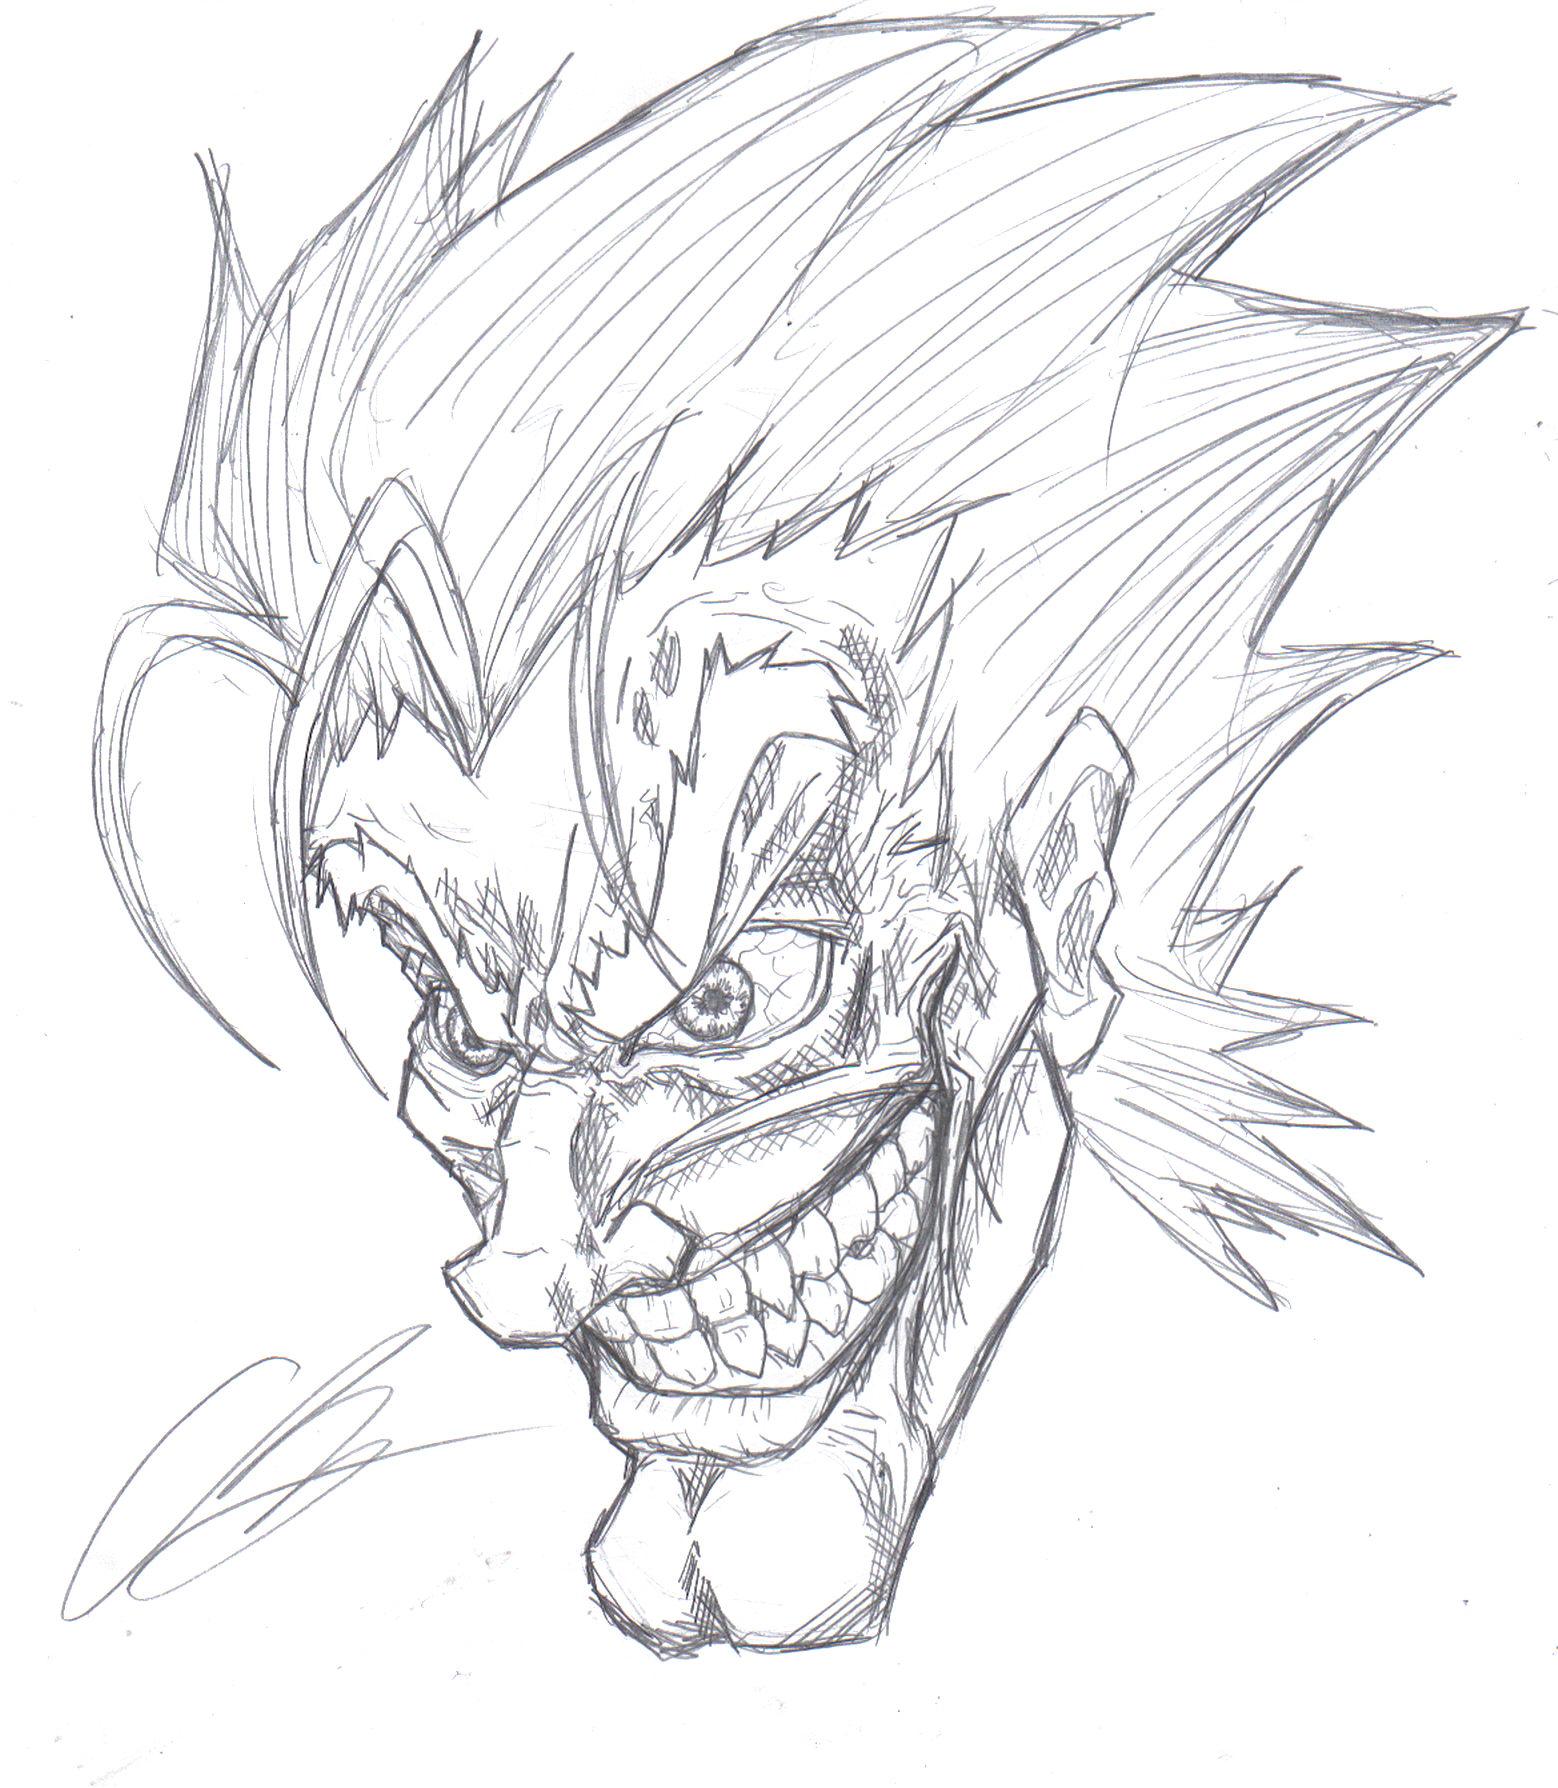 The Joker By Kingvego The Joker By Kingvego